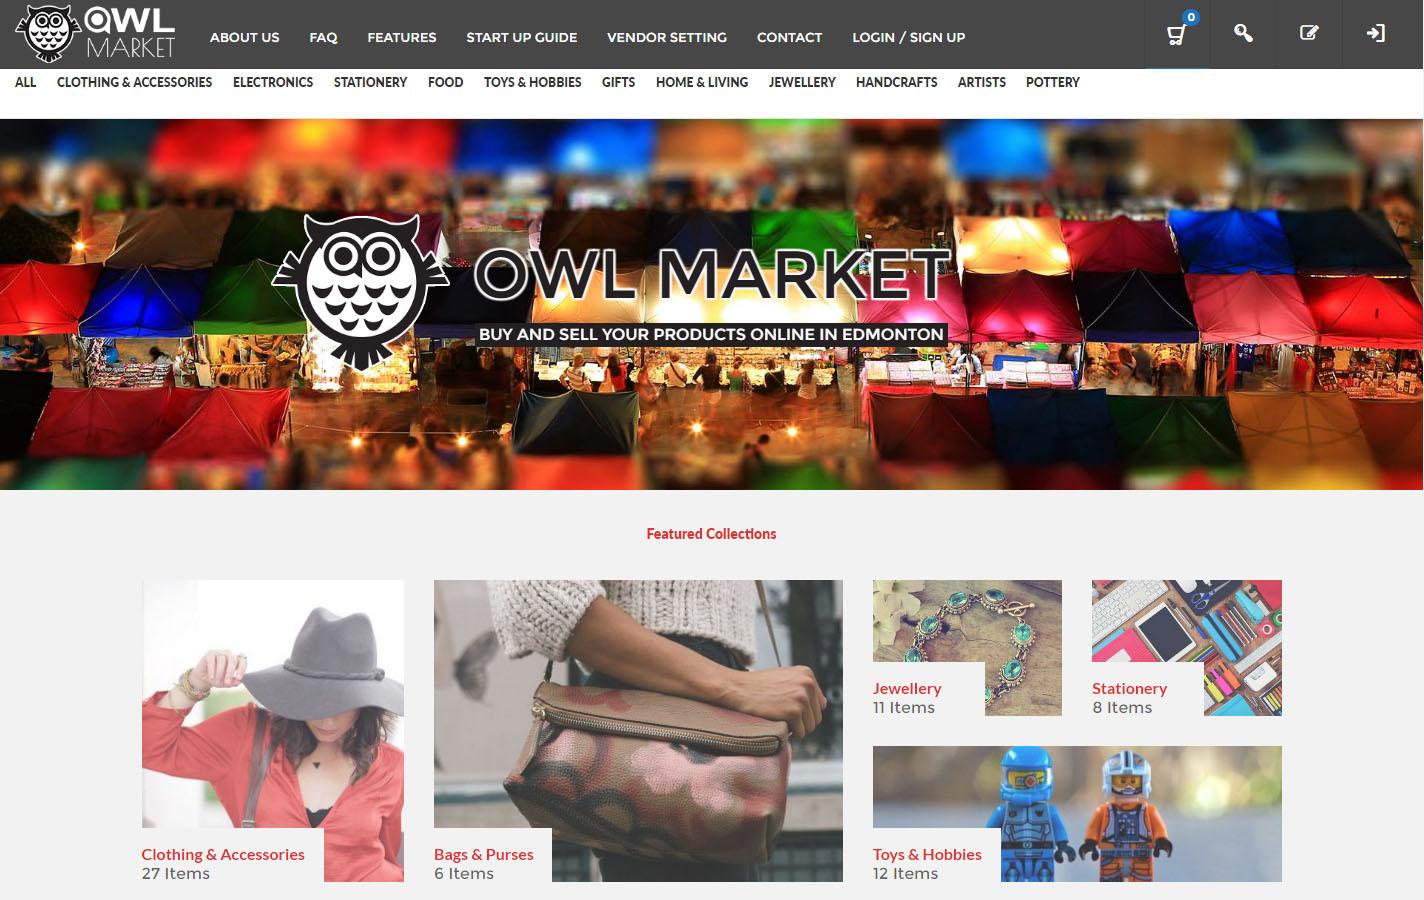 owlmarket